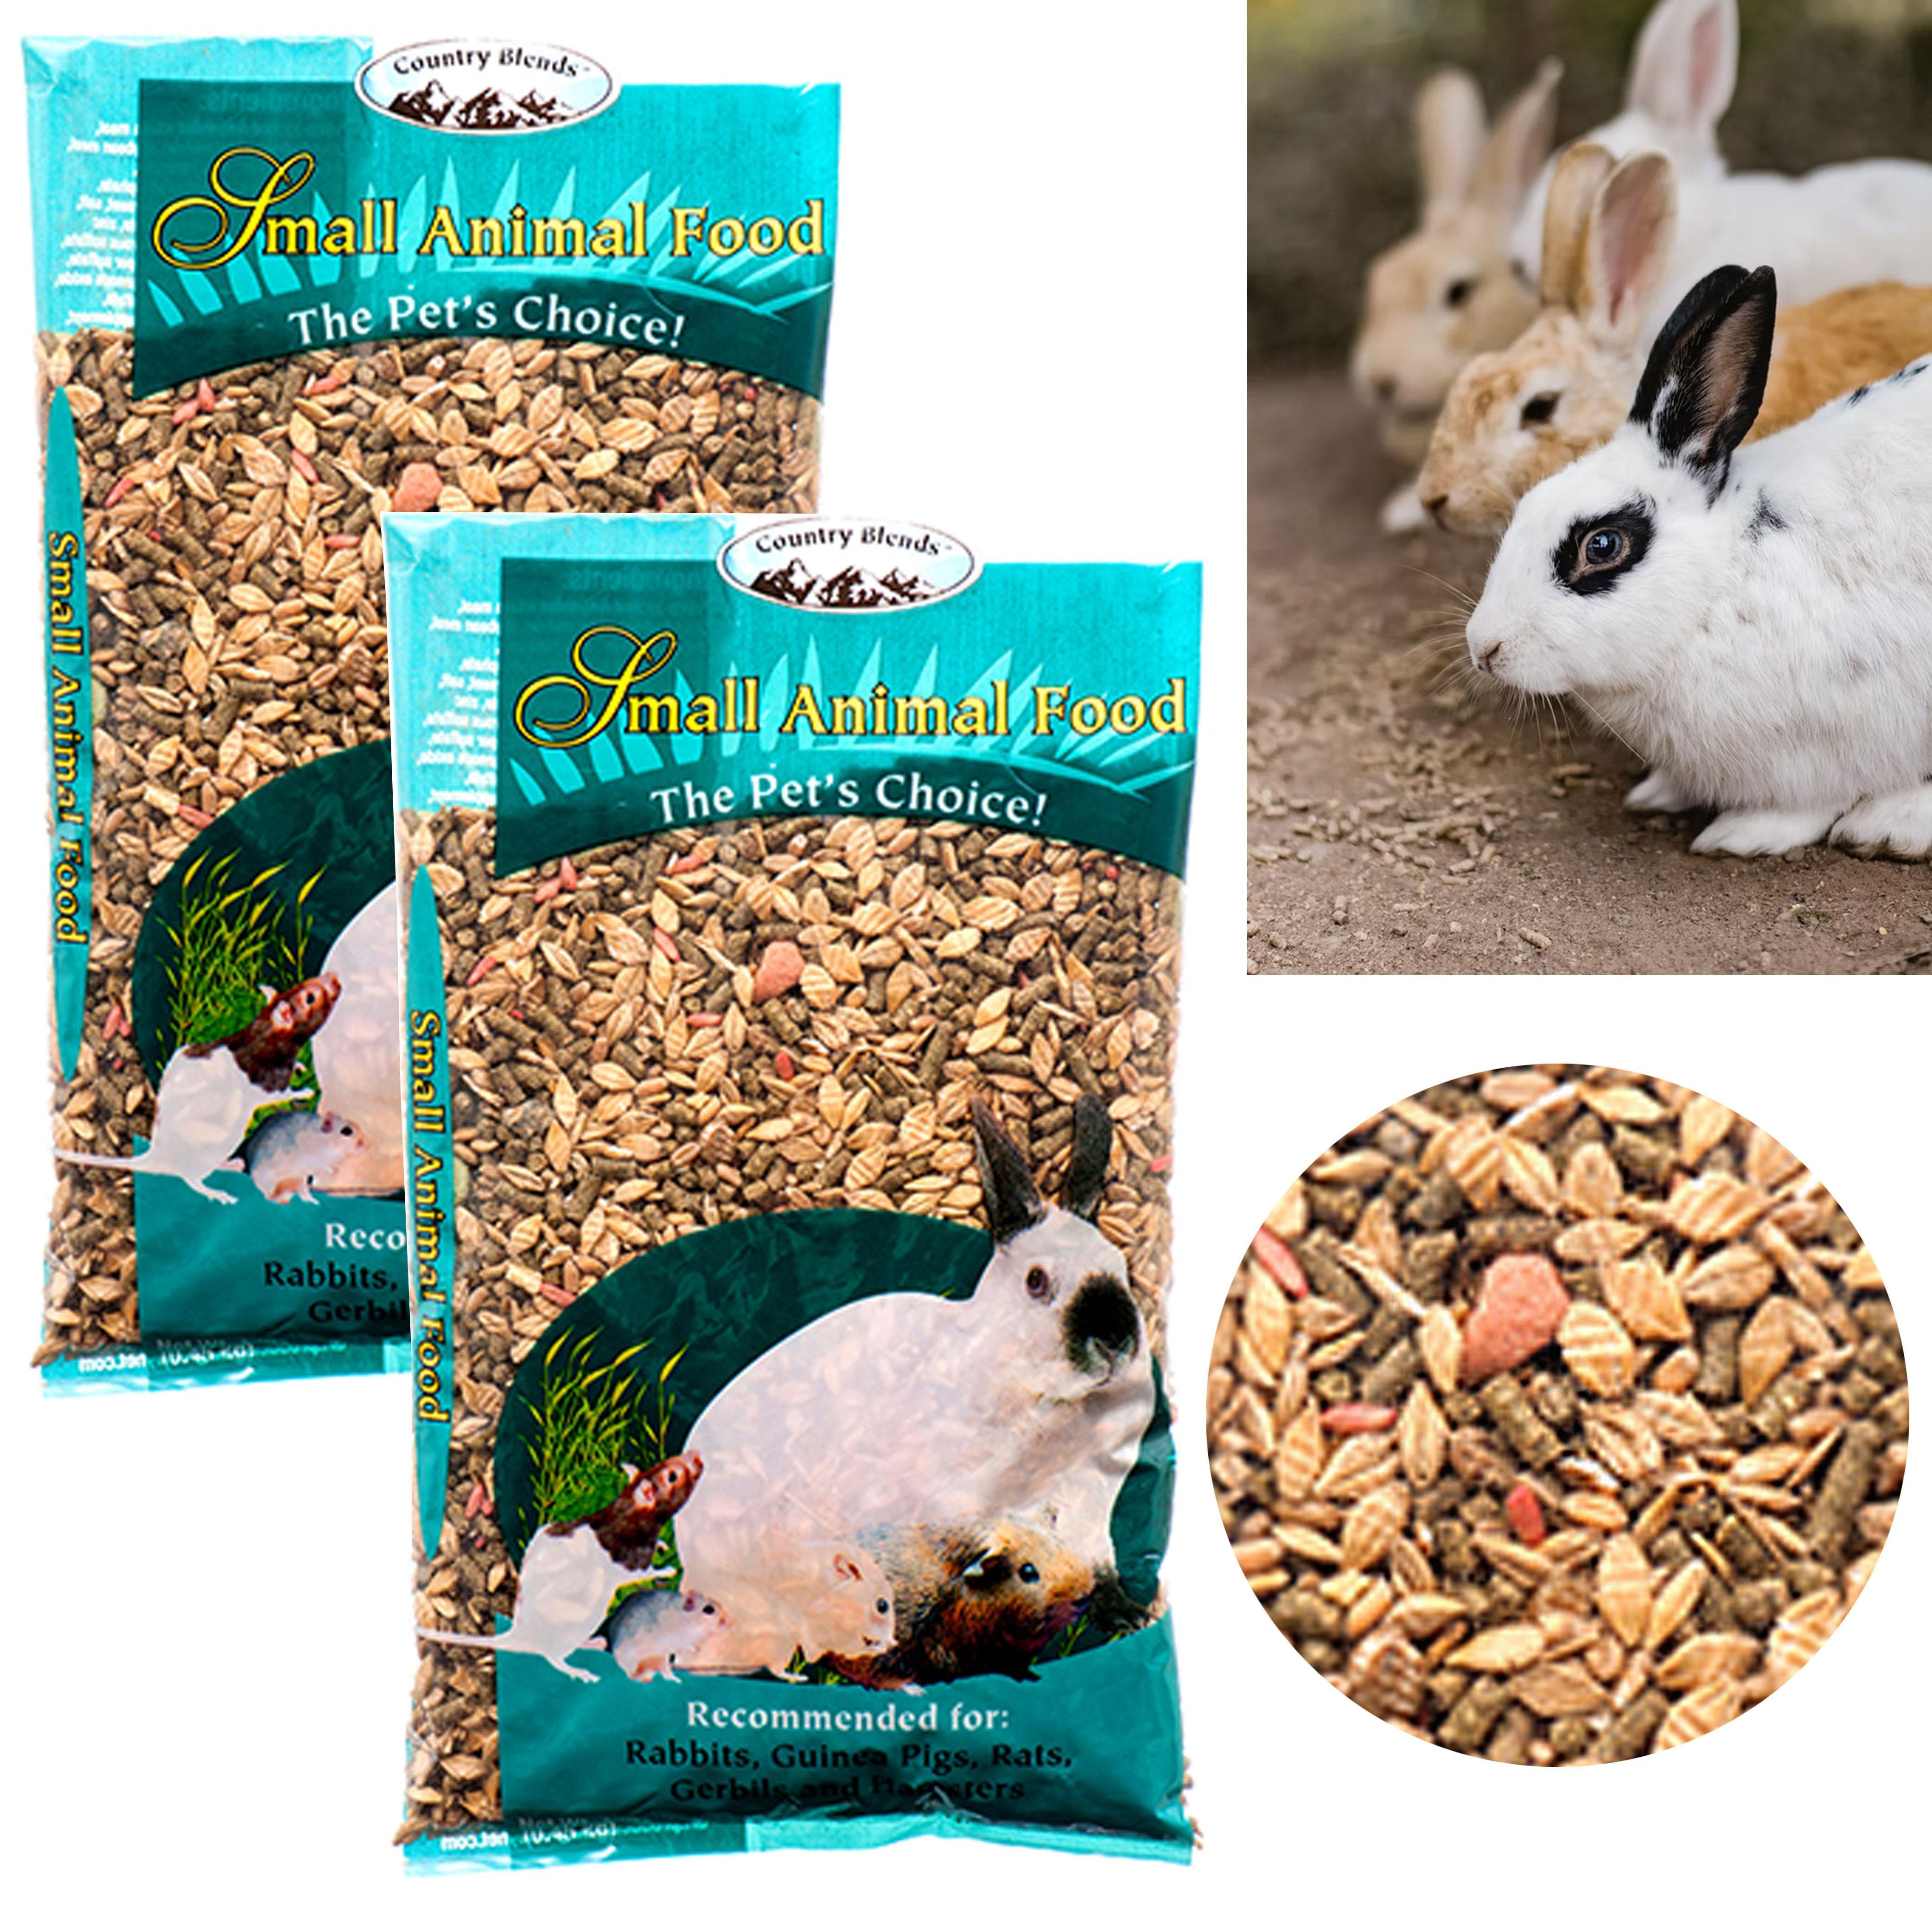 2lb Rabbit Food Bunny Rabbits Nibble Guinea Pigs Hamsters Small Animal Treat Pet